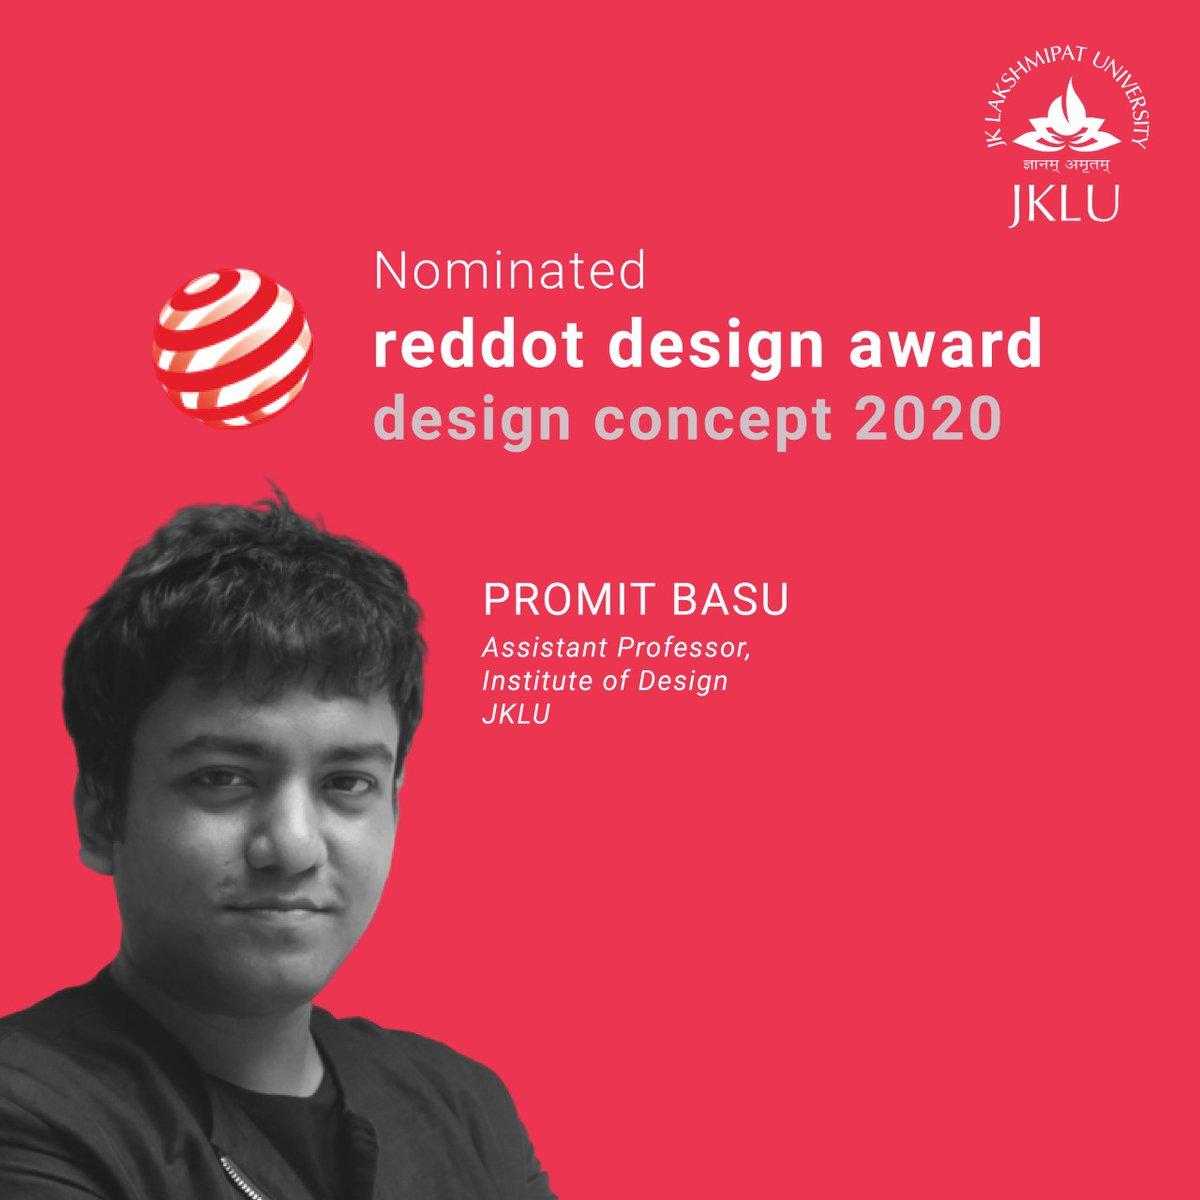 Congratulations to our faculty and design virtuoso Promit Basu for the prestigious REDDOT CONCEPT DESIGN AWARD 2020 nomination.  #reddotaward #productdesign #designconcept #indiandesigners #award #JKLUpic.twitter.com/kPGbHQMERs